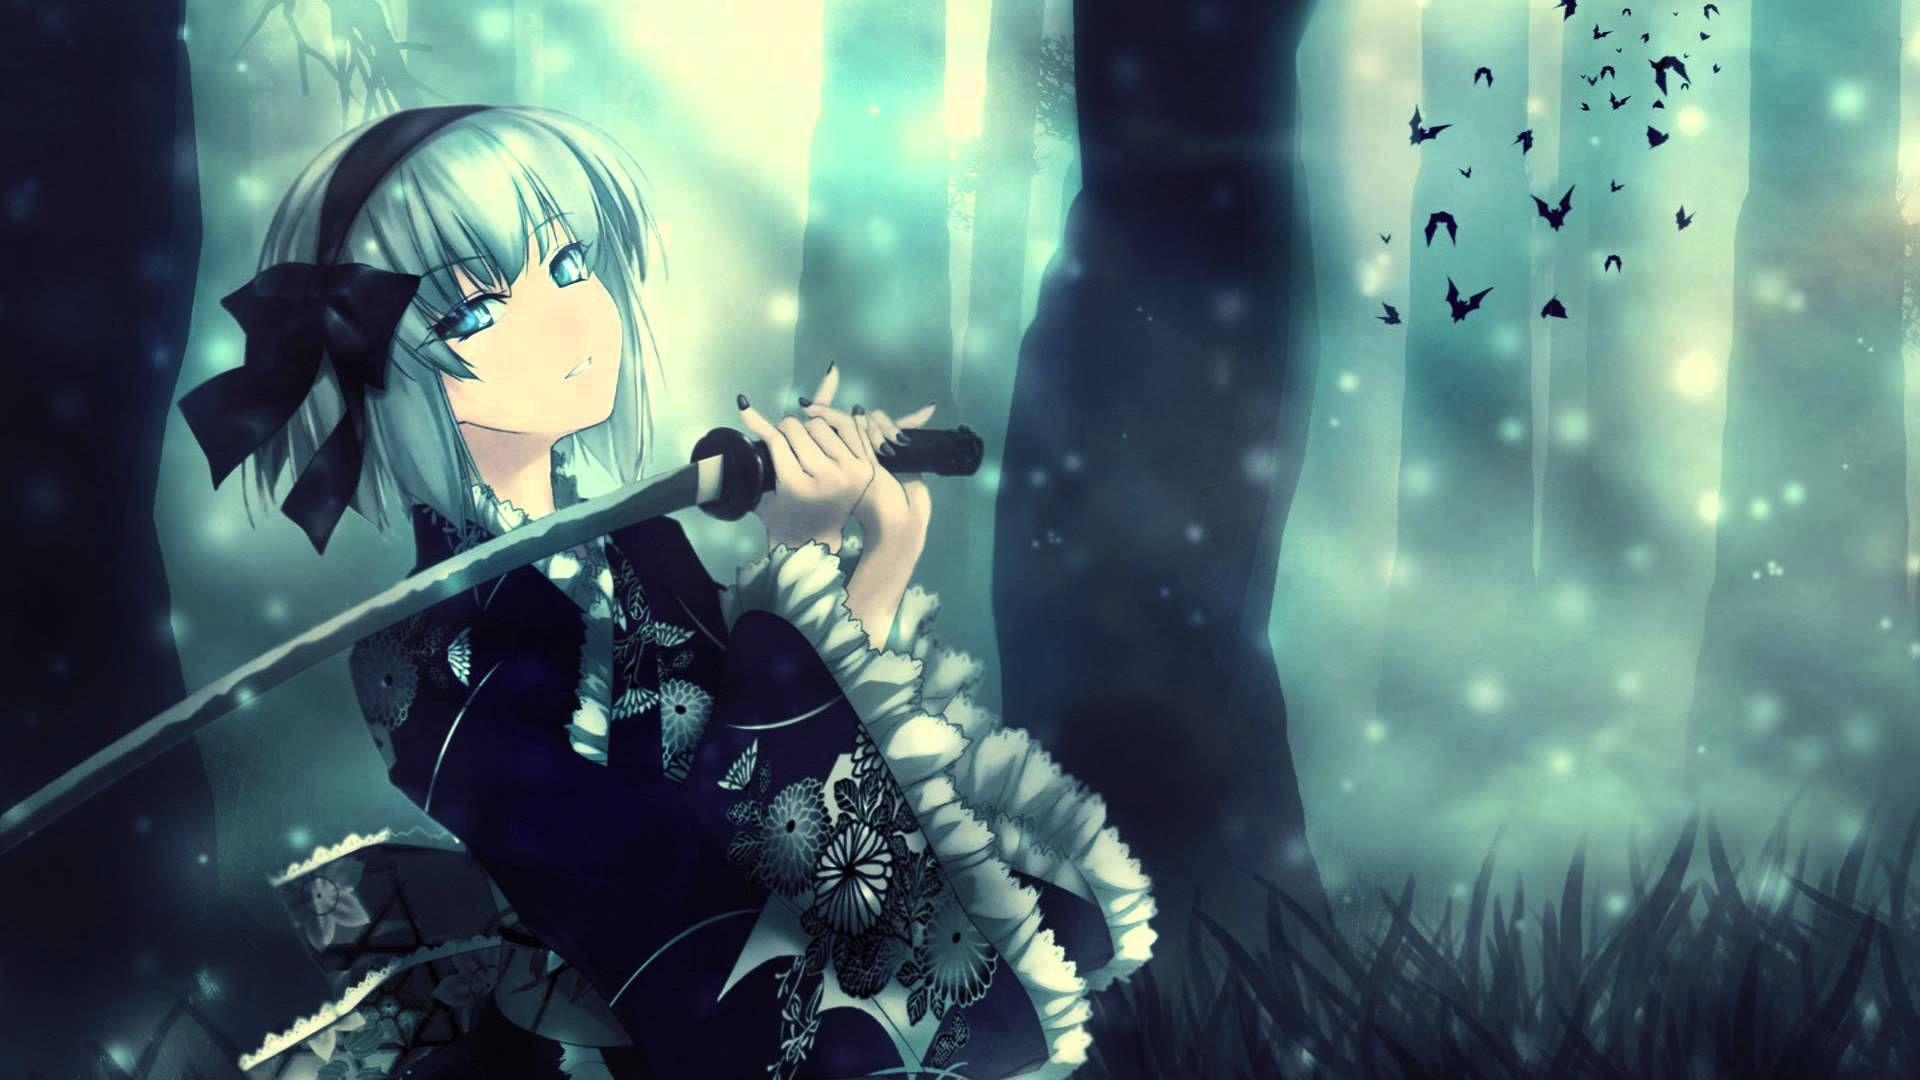 Nightcore - Take Me To Church † Female Version. Amazing!